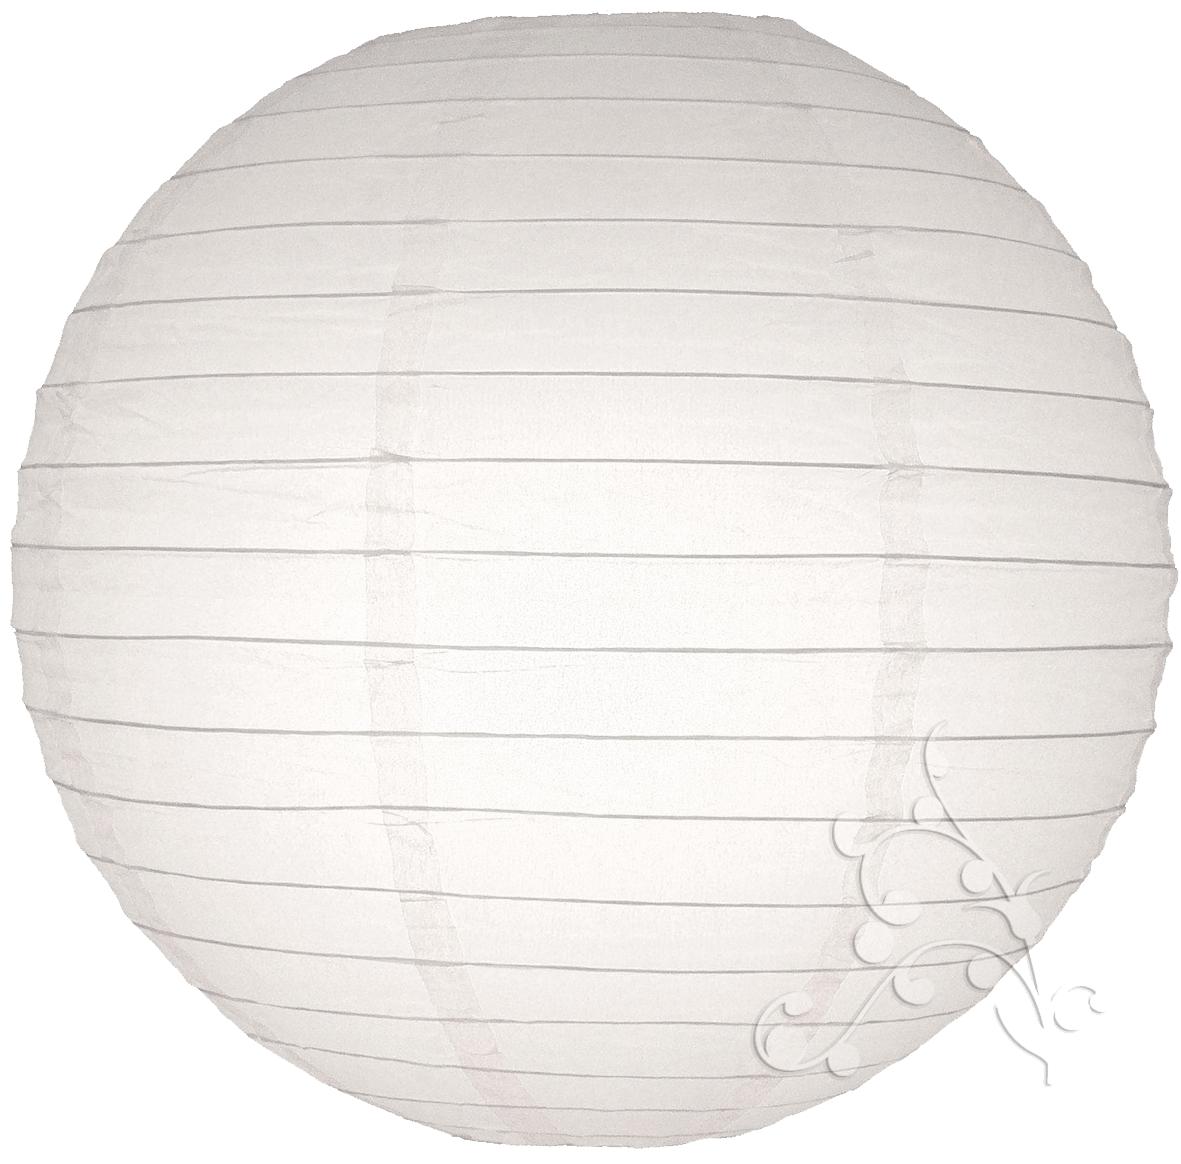 30 inch large white even ribbed round lanterns. Black Bedroom Furniture Sets. Home Design Ideas